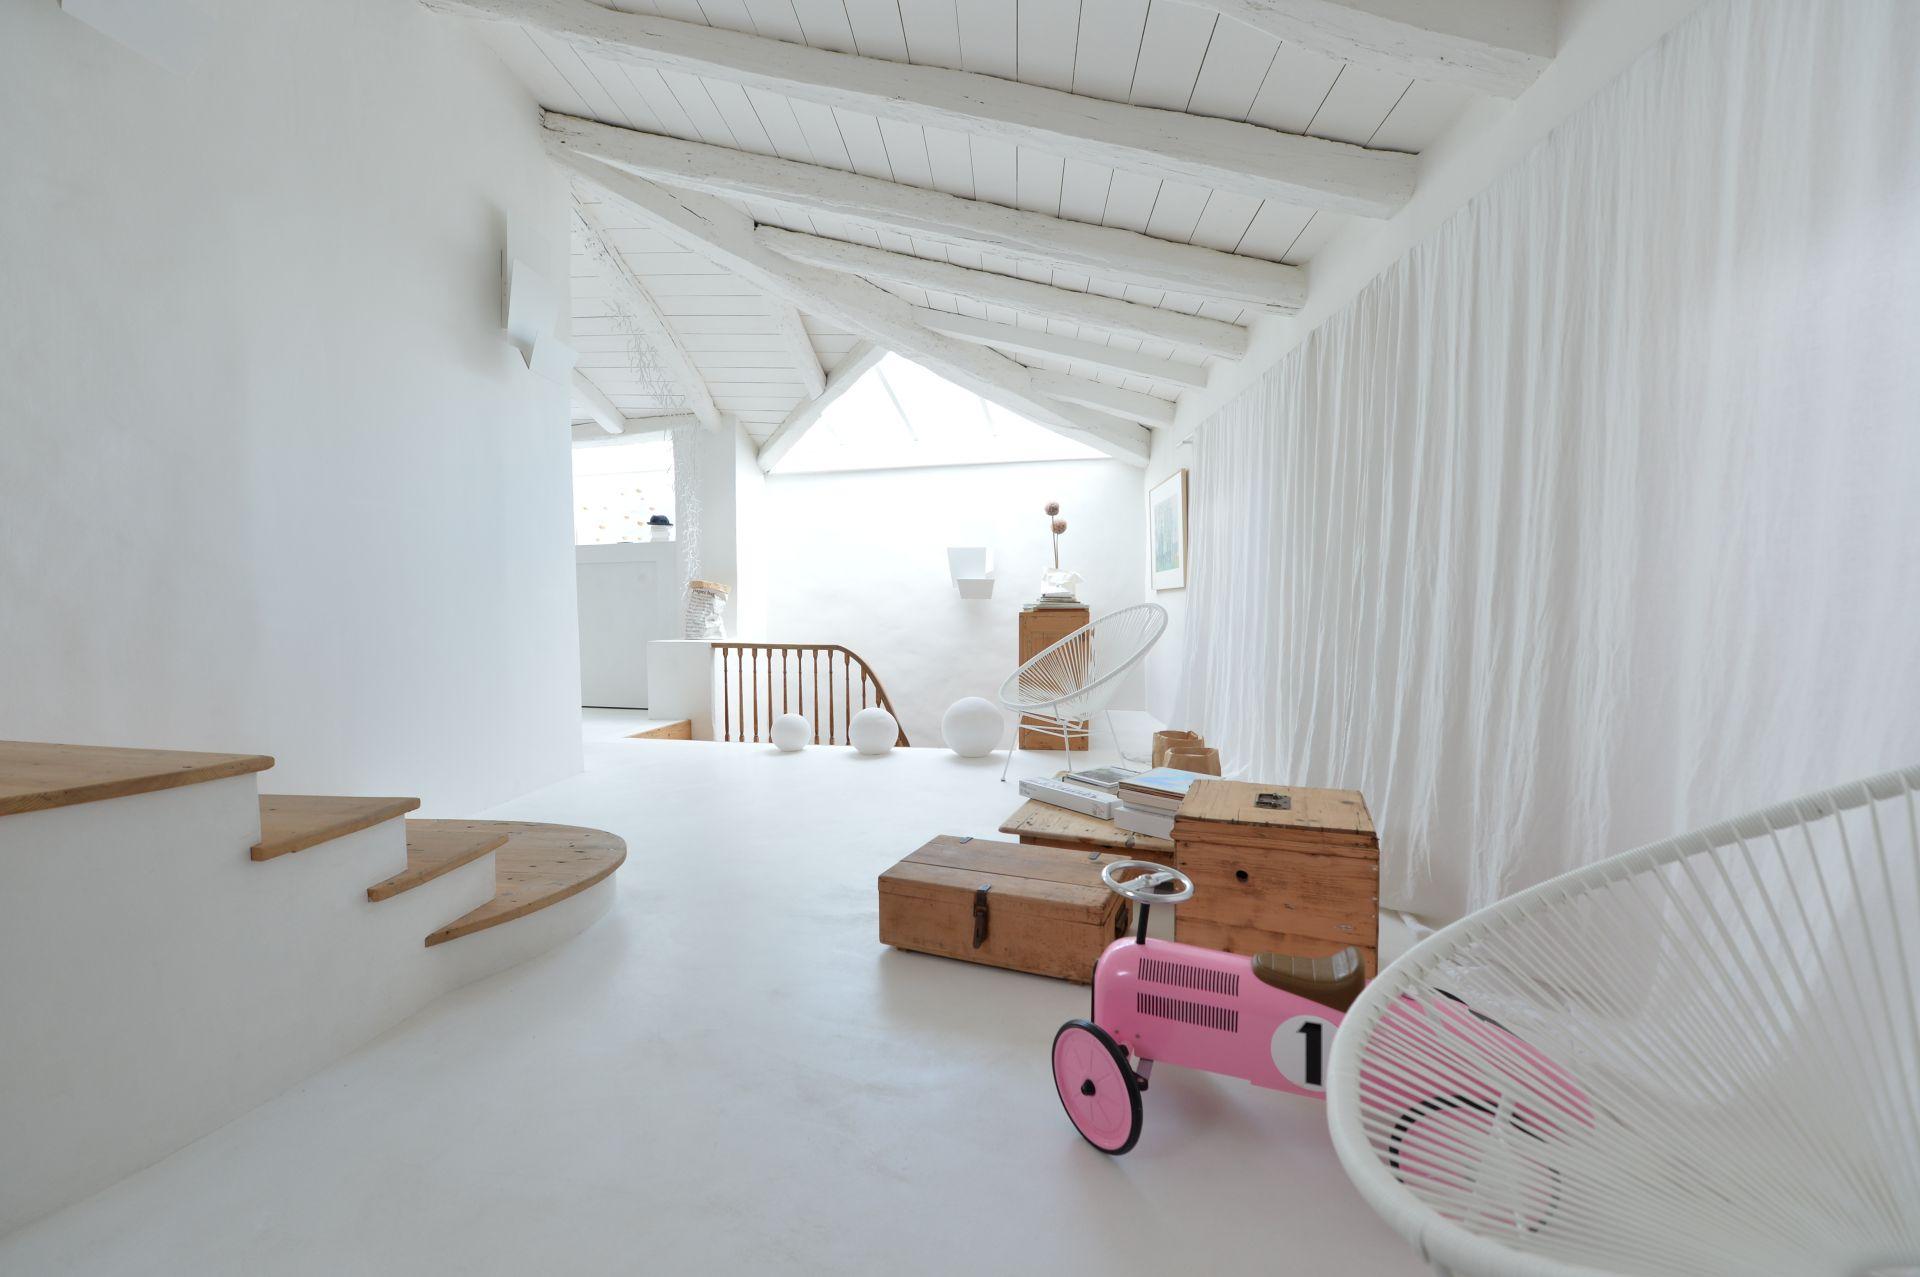 ateliers lofts associ s agence immobili re contemporaine. Black Bedroom Furniture Sets. Home Design Ideas